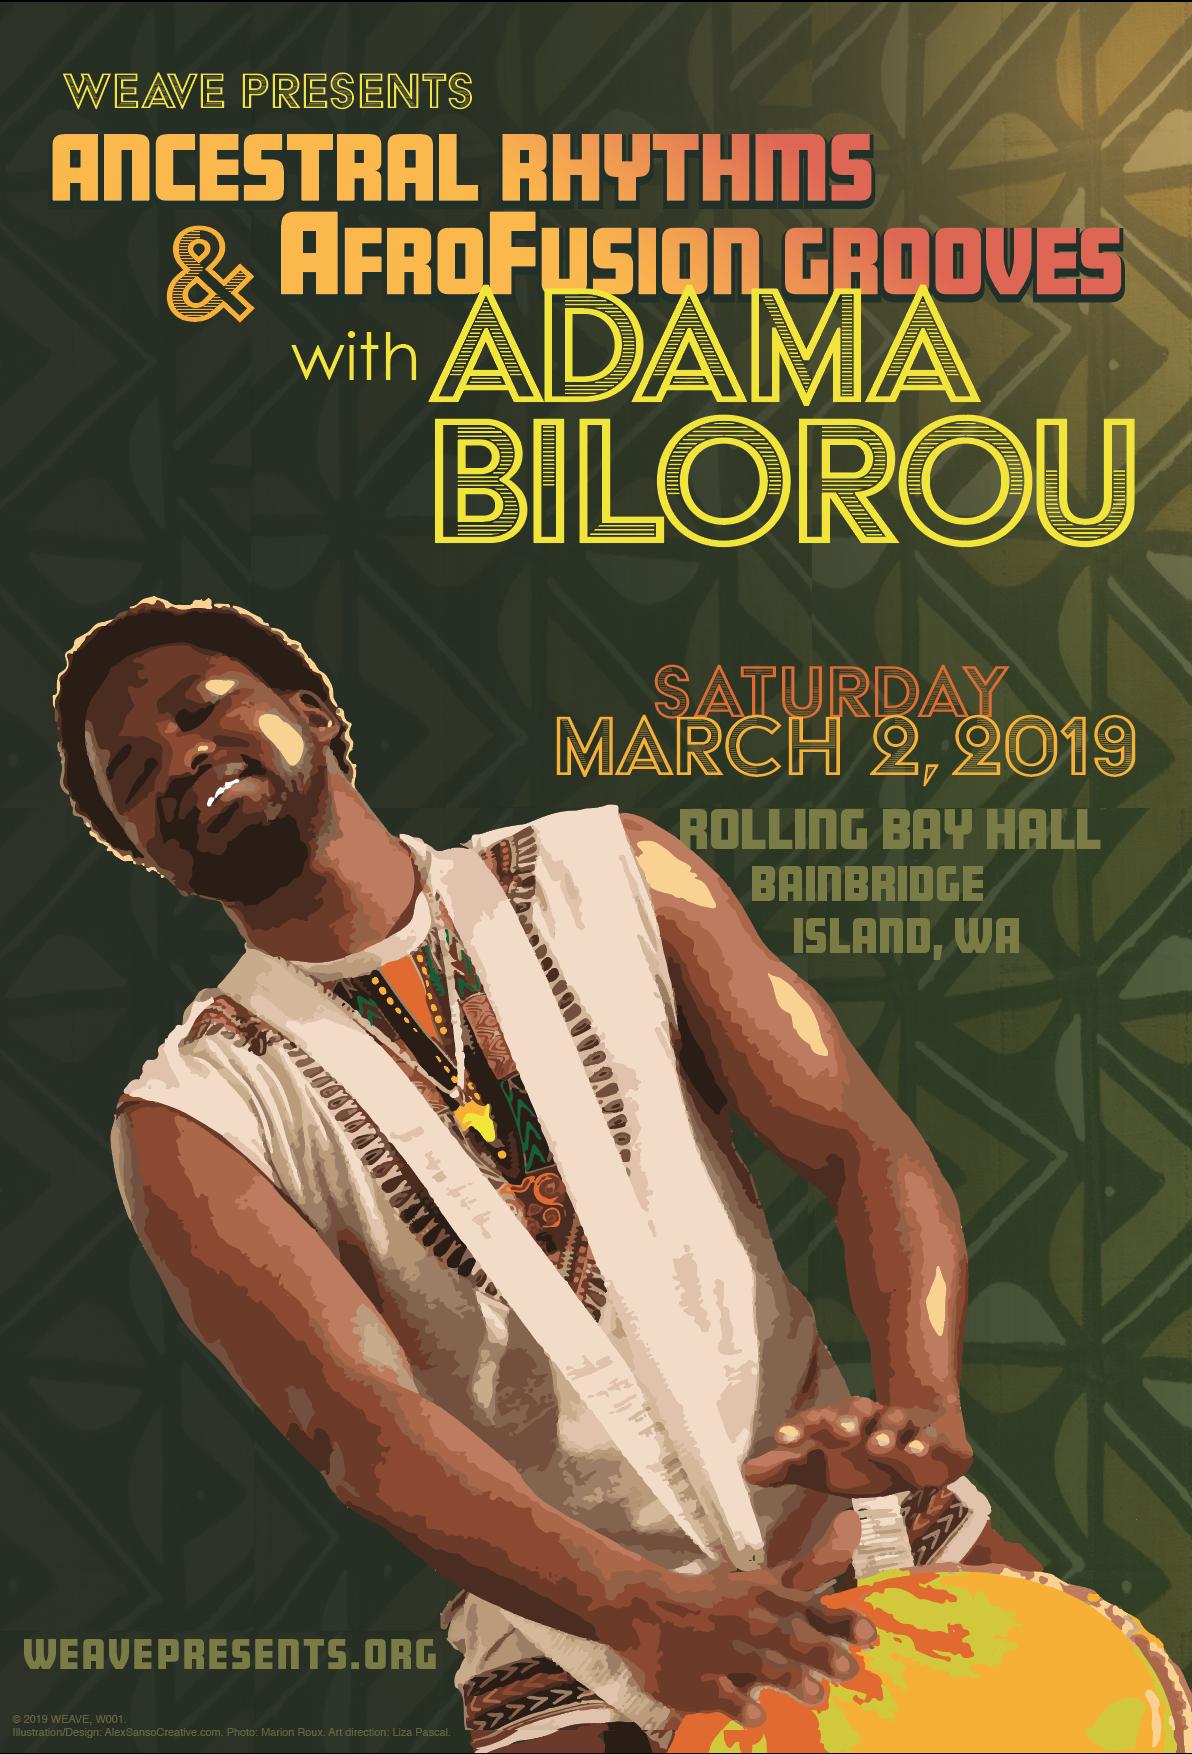 Adama Bilorou concert poster